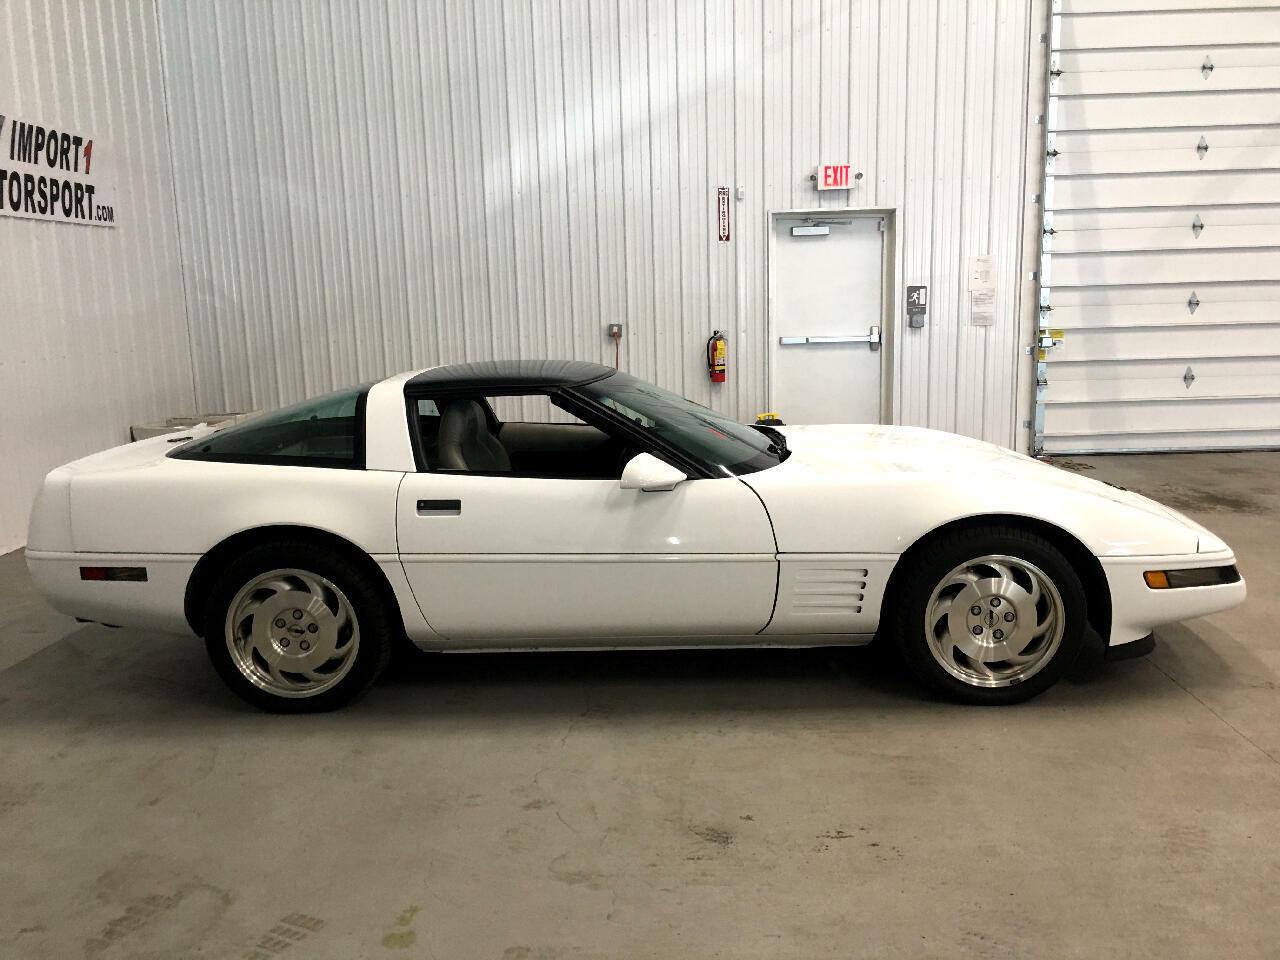 1994 White Chevrolet Corvette Coupe    C4 Corvette Photo 2